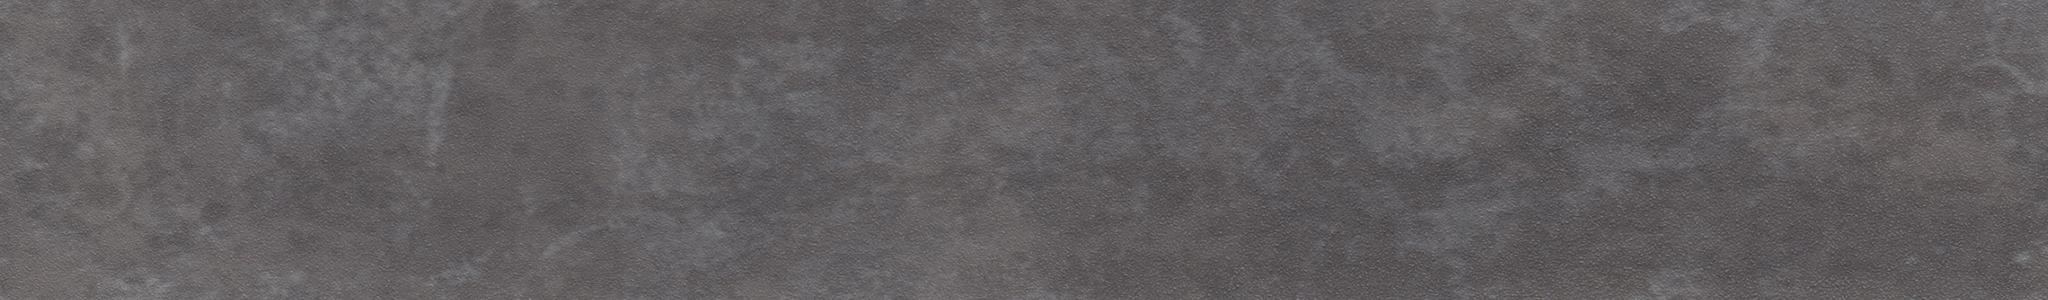 HD 295299 ABS Edge Dark Atelier Pearl